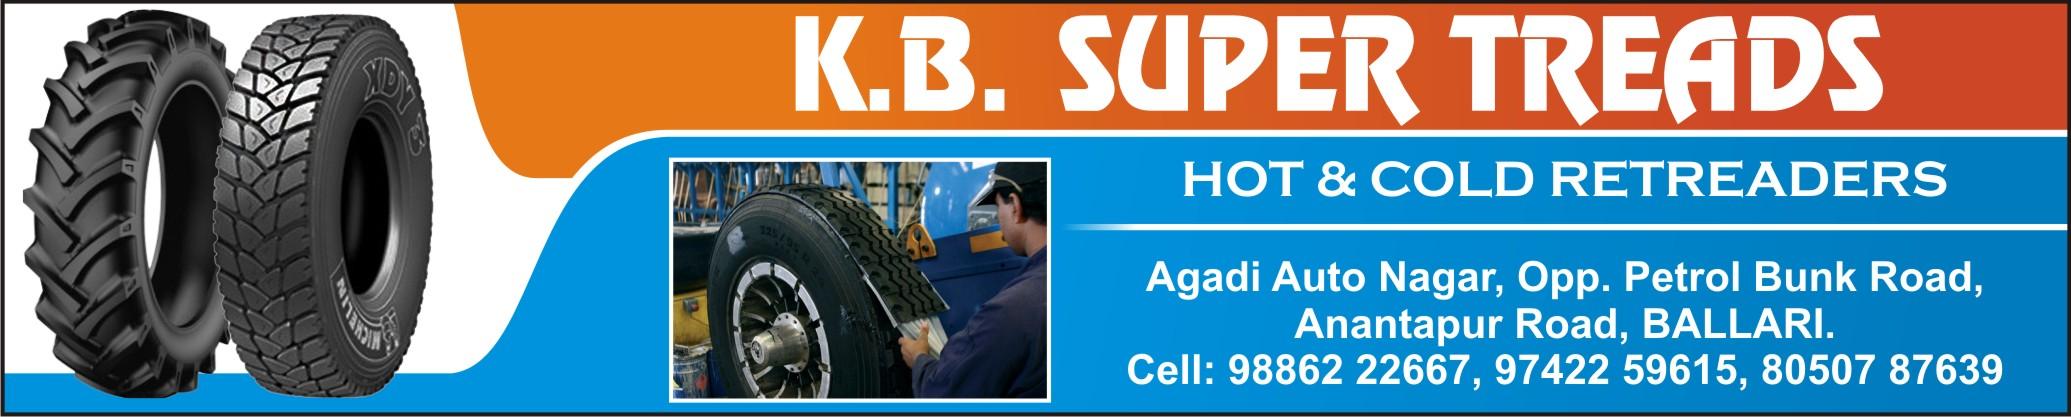 K.B. SUPER TREADS